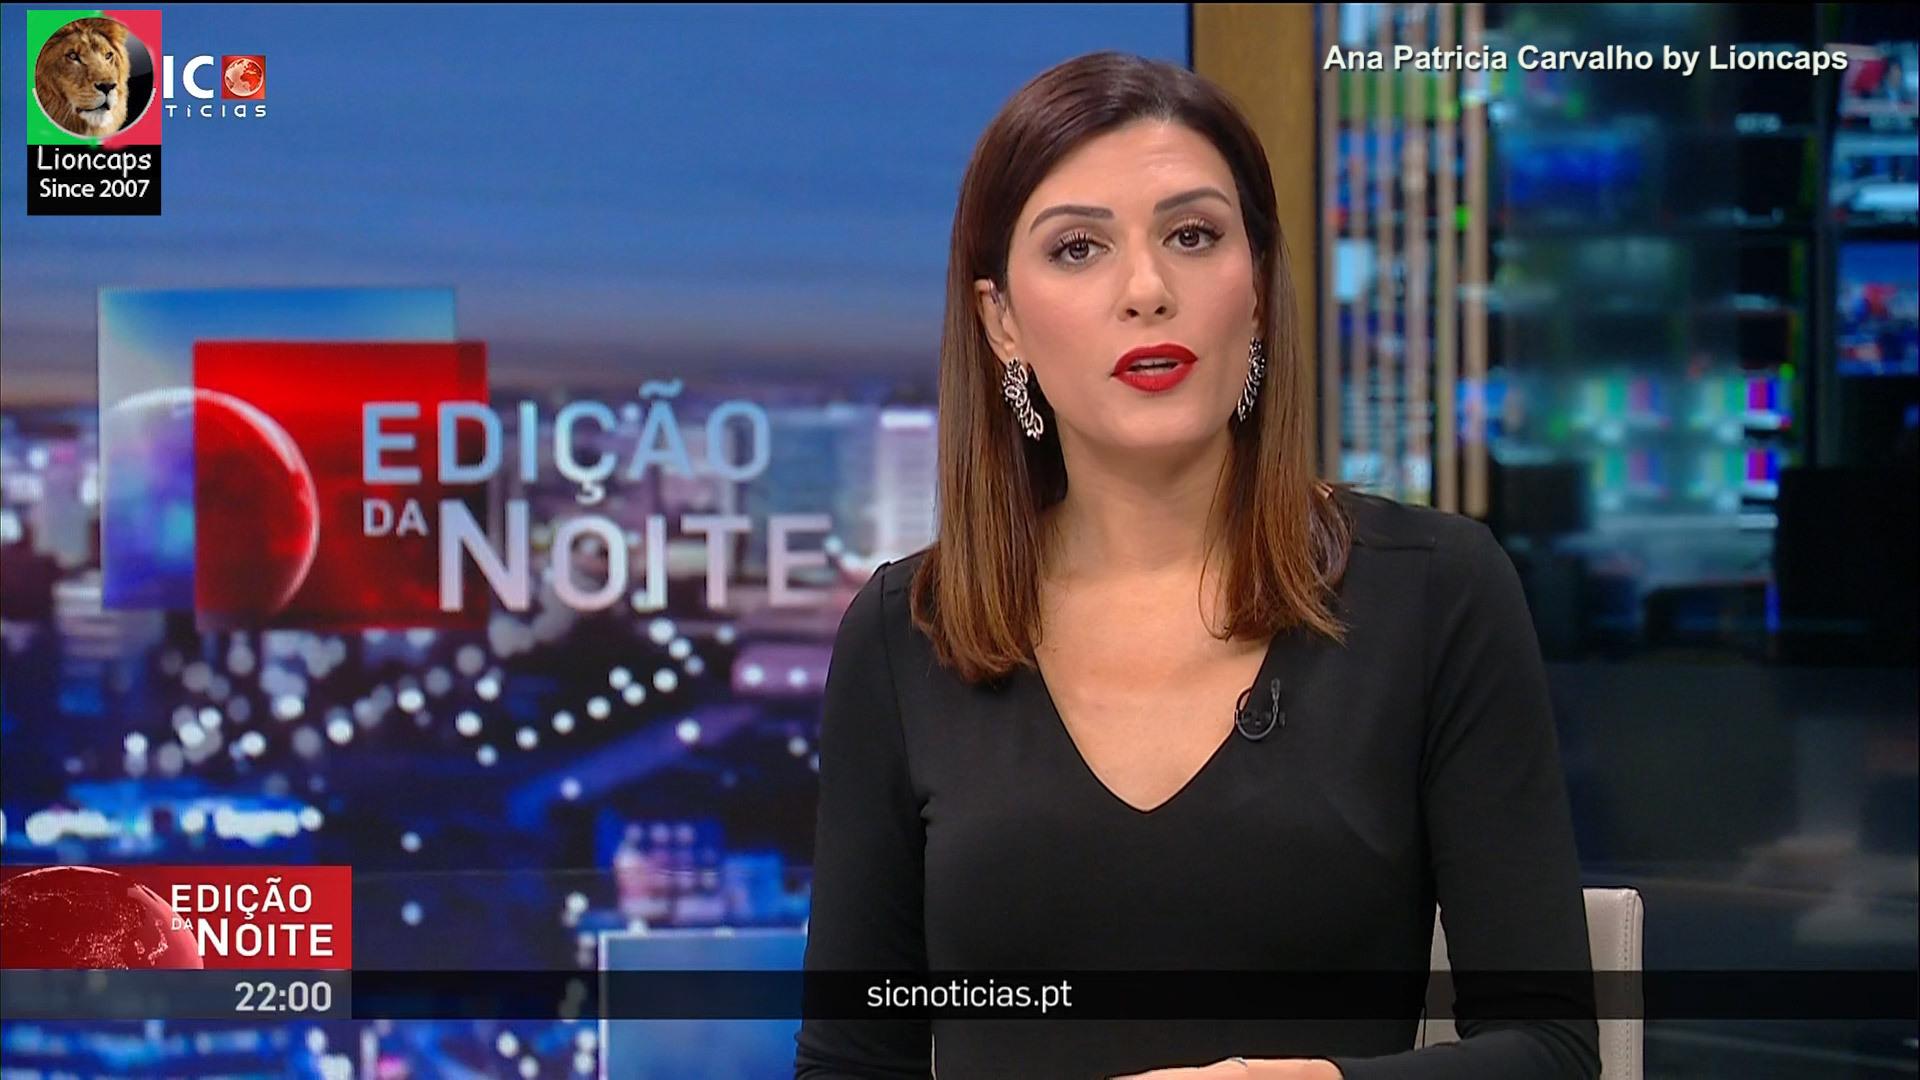 ana_patricia_carvalho_sicn_lioncaps_30_05_2021 (12).jpg